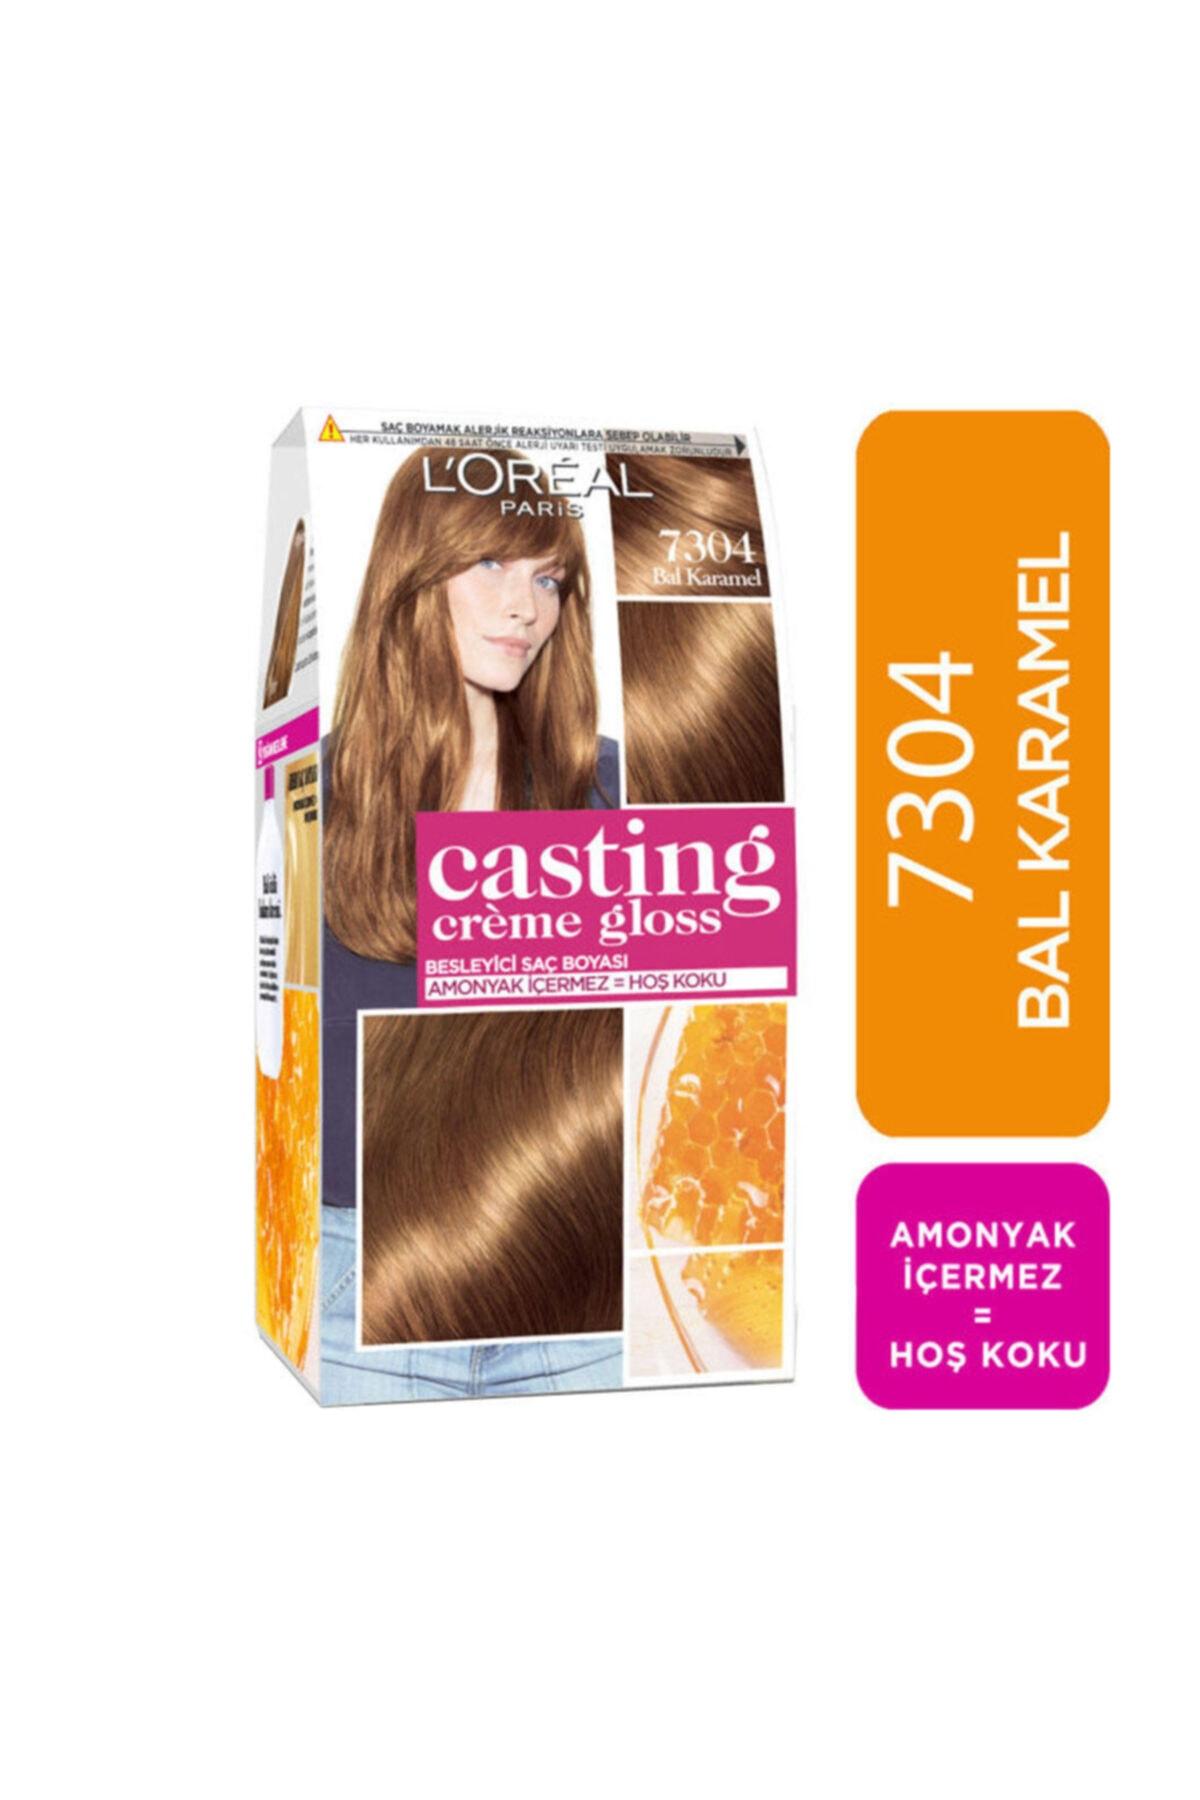 Saç Boyası - Casting Creme Gloss 7304 Bal Karamel 3600523302871